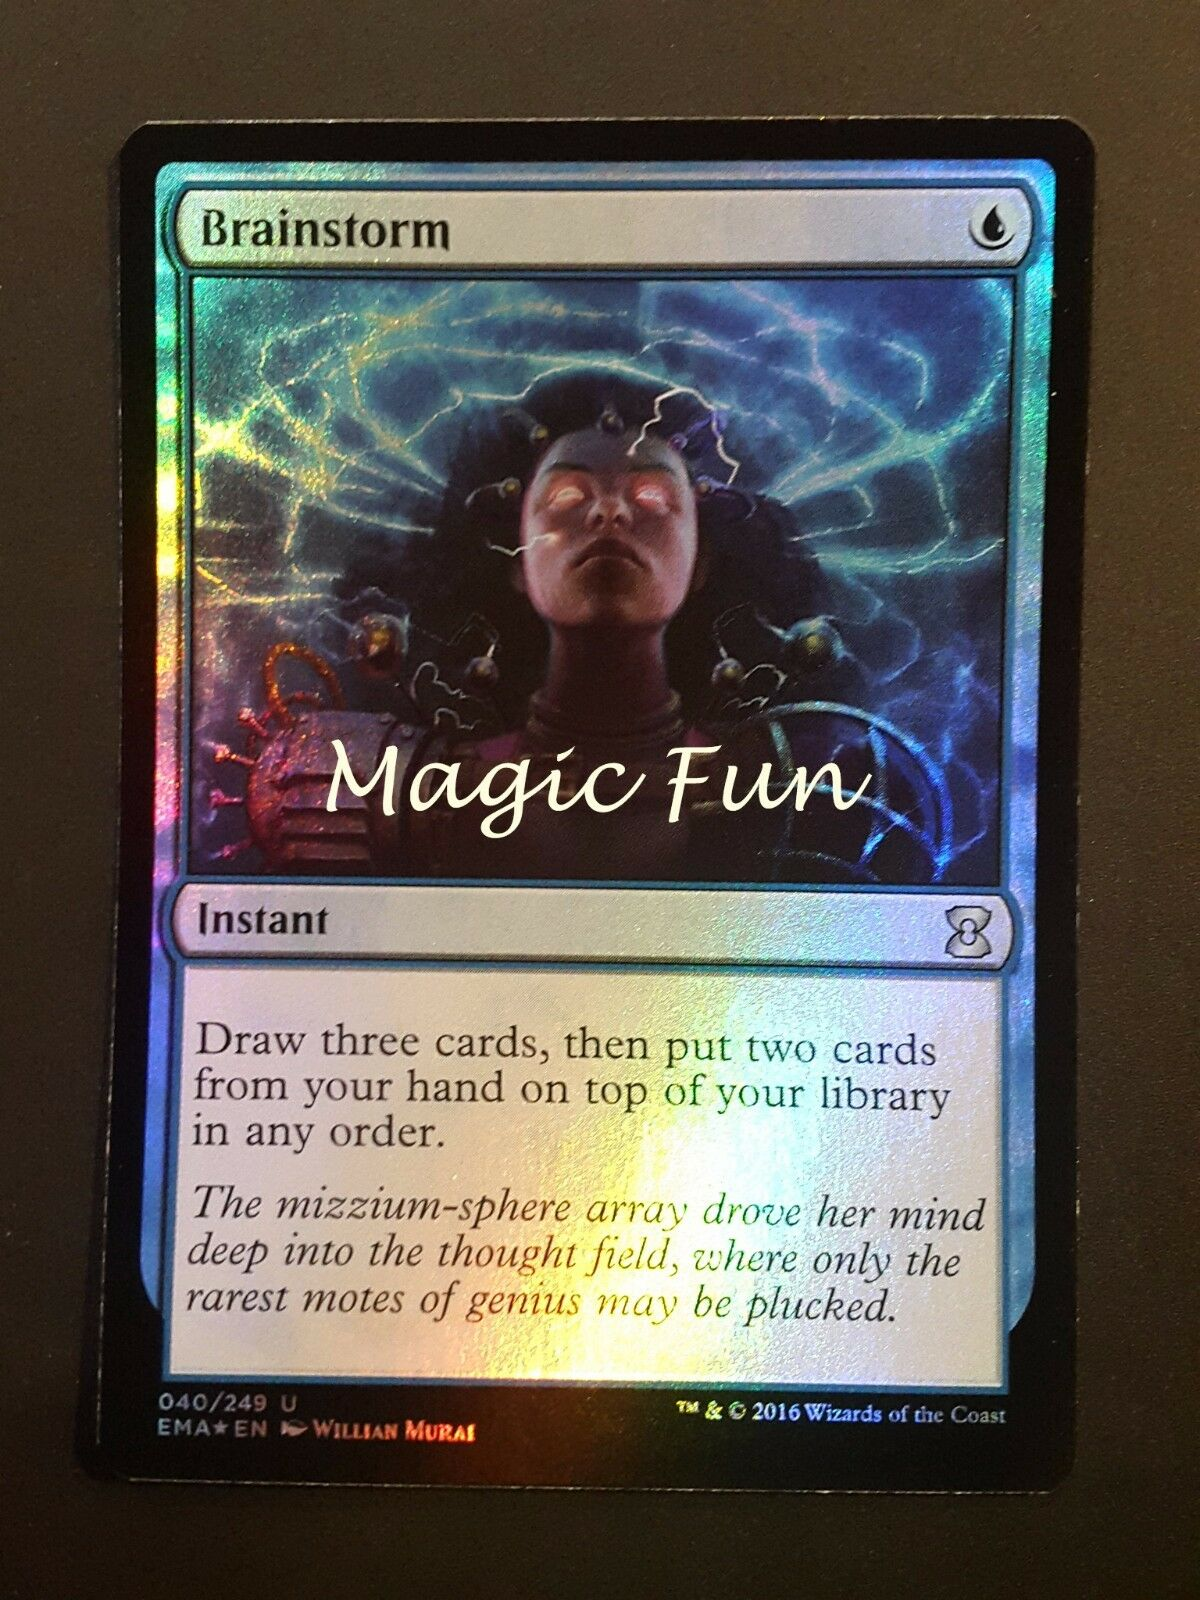 Sturm ZEREBRALE - BRAINSTORM BRAINSTORM BRAINSTORM Folie ENG - MTG MAGIC [magicfun] d471dd